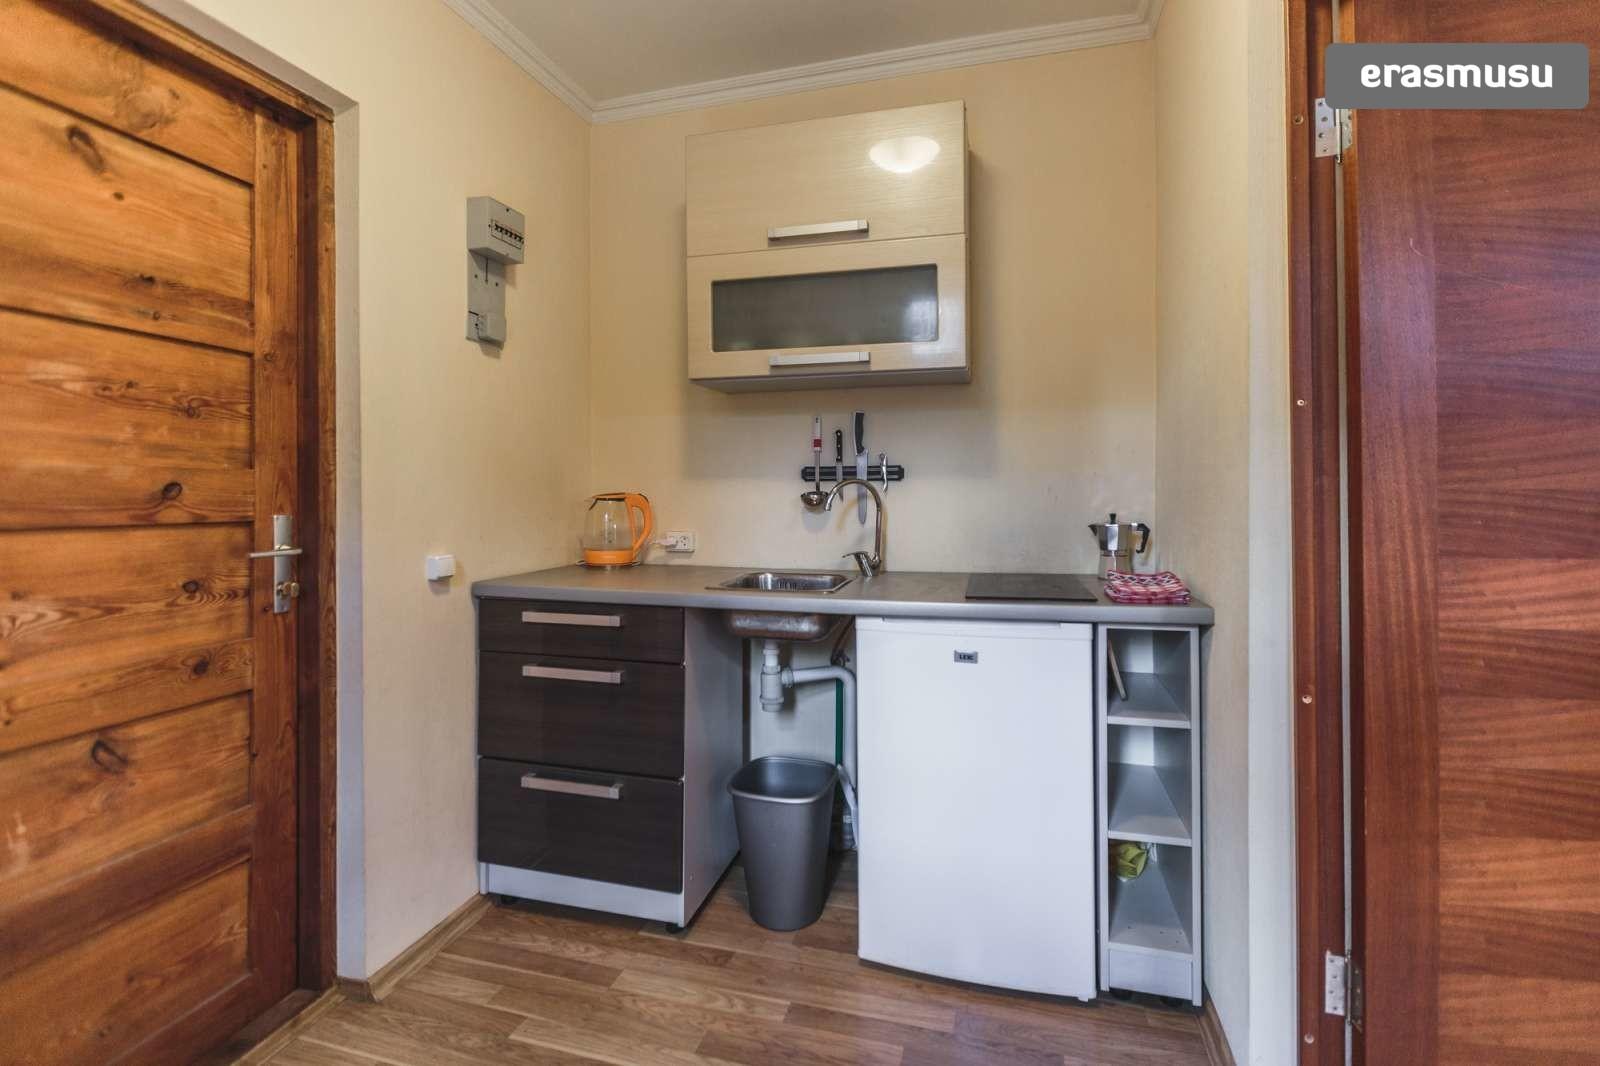 stylish-studio-apartment-rent-avoti-7c4638d6aed6e3f1b0fd4ea5c966